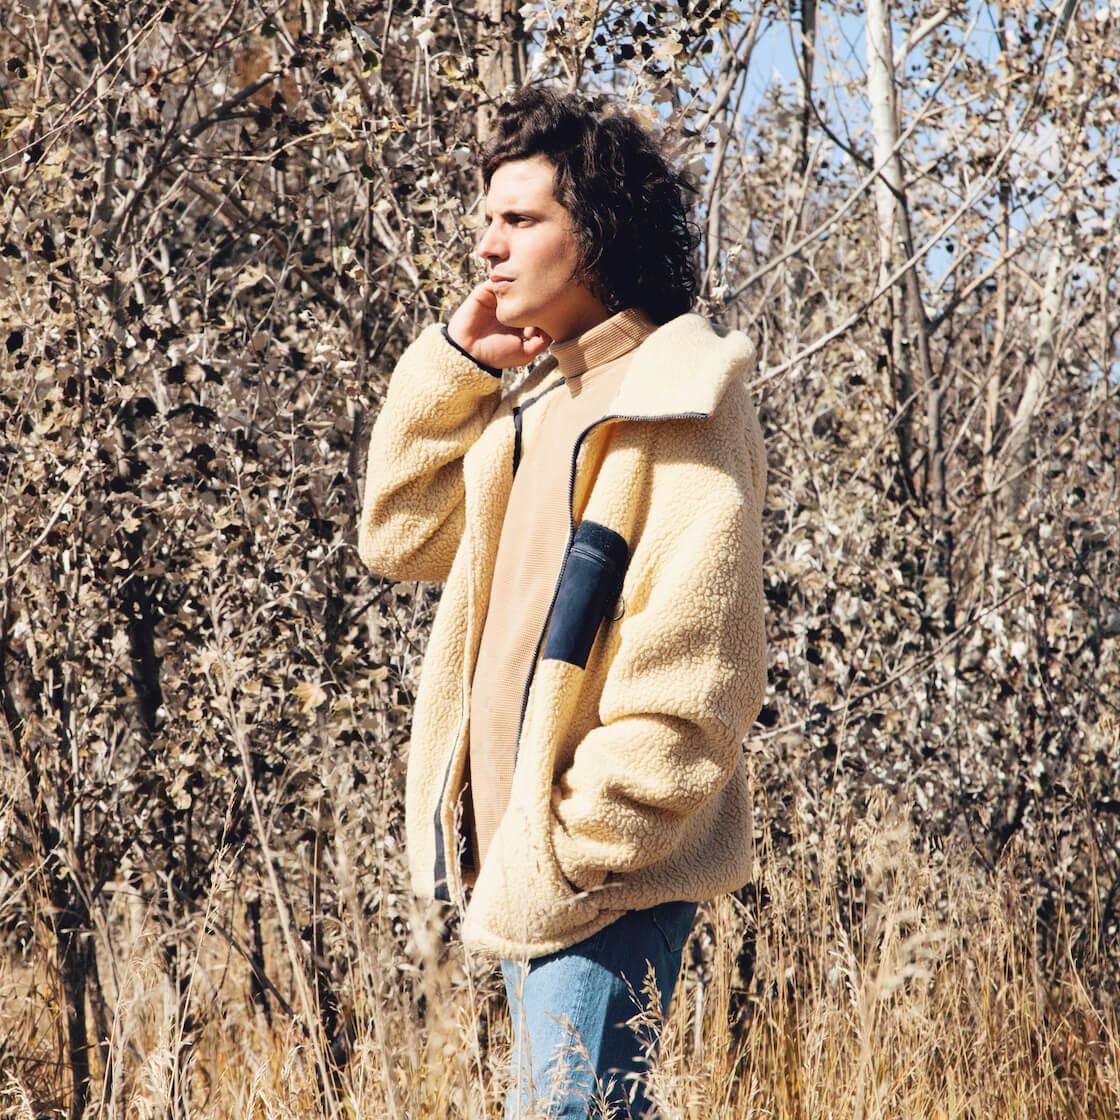 nanamica fleece jacket, nanamica turtle neck shirt, and orslow jeans on body